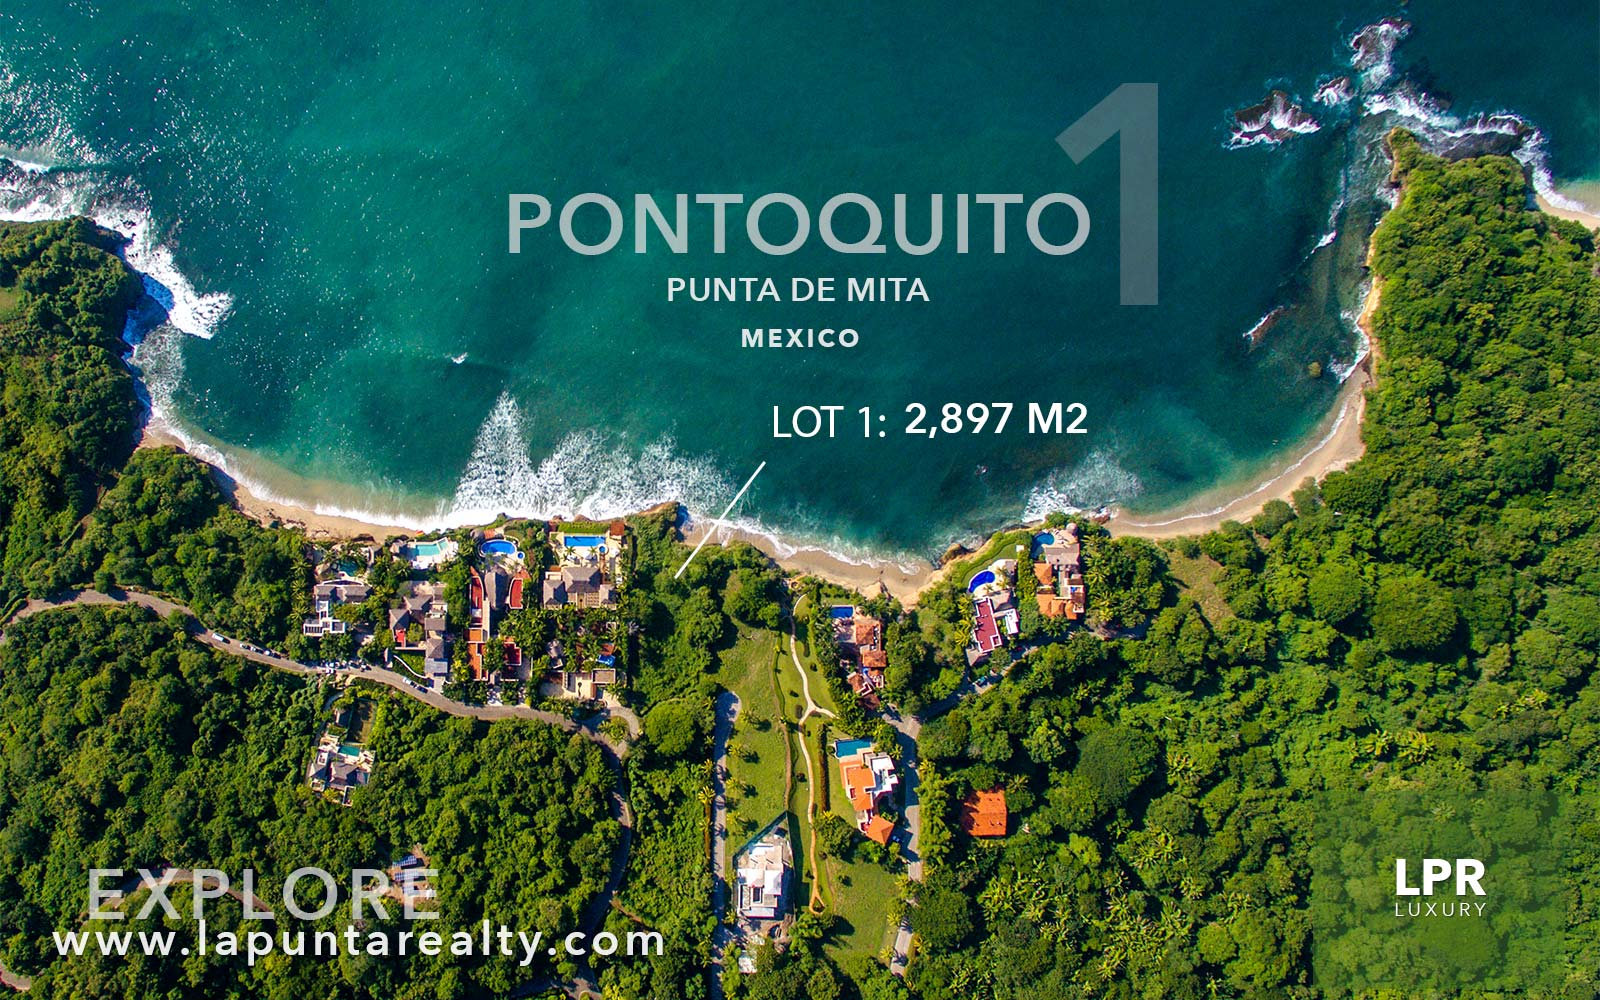 Pontoquito - Lot 1 - Punta de Mita luxury real estate